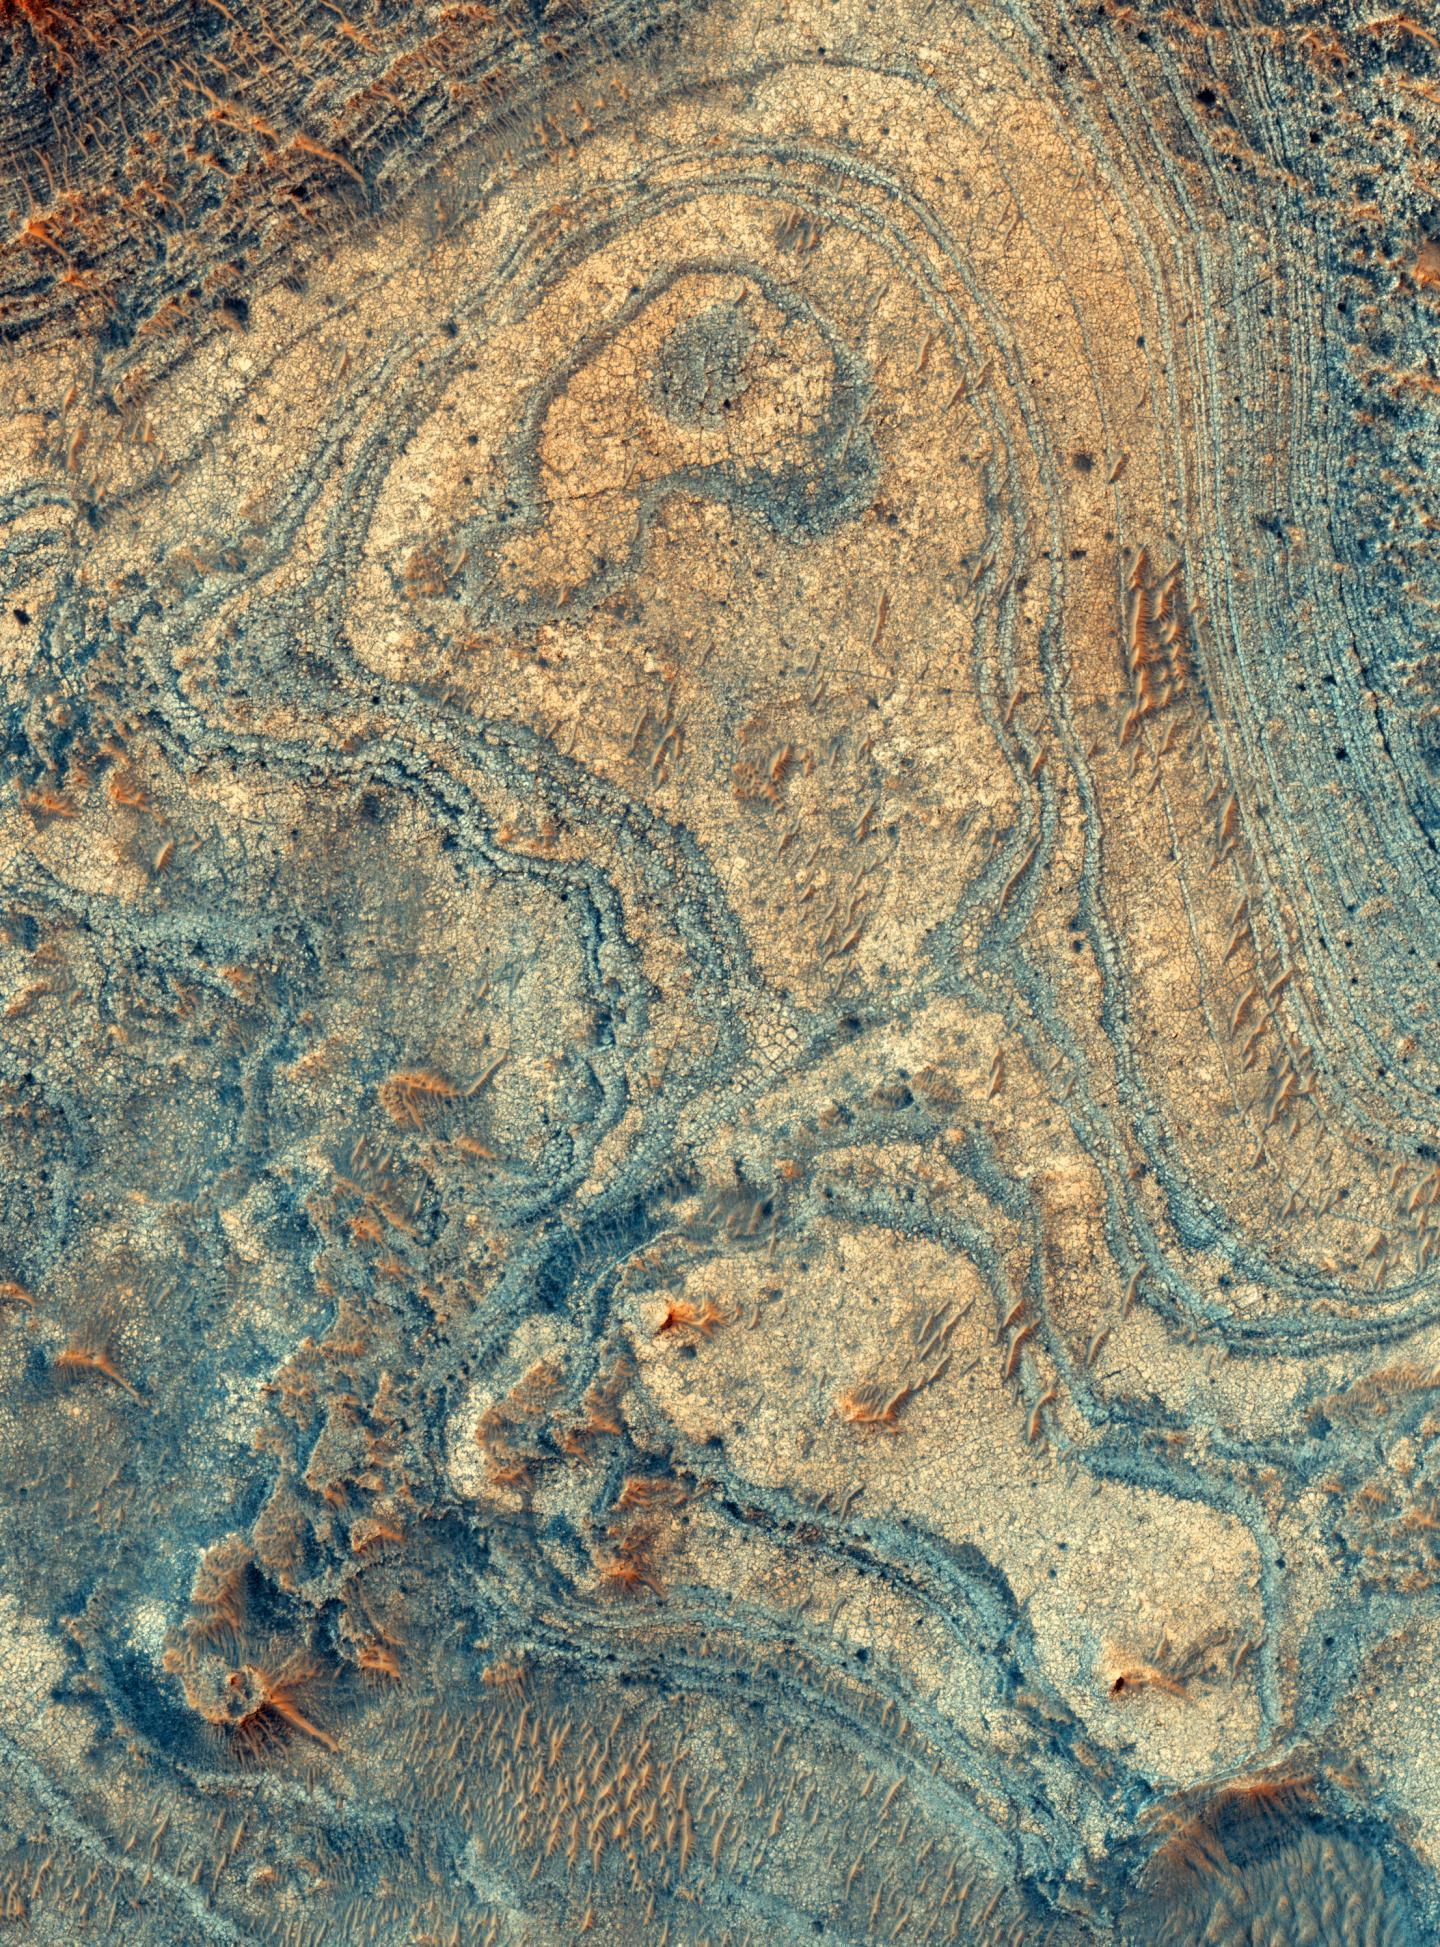 Strange Formation Found on Mars